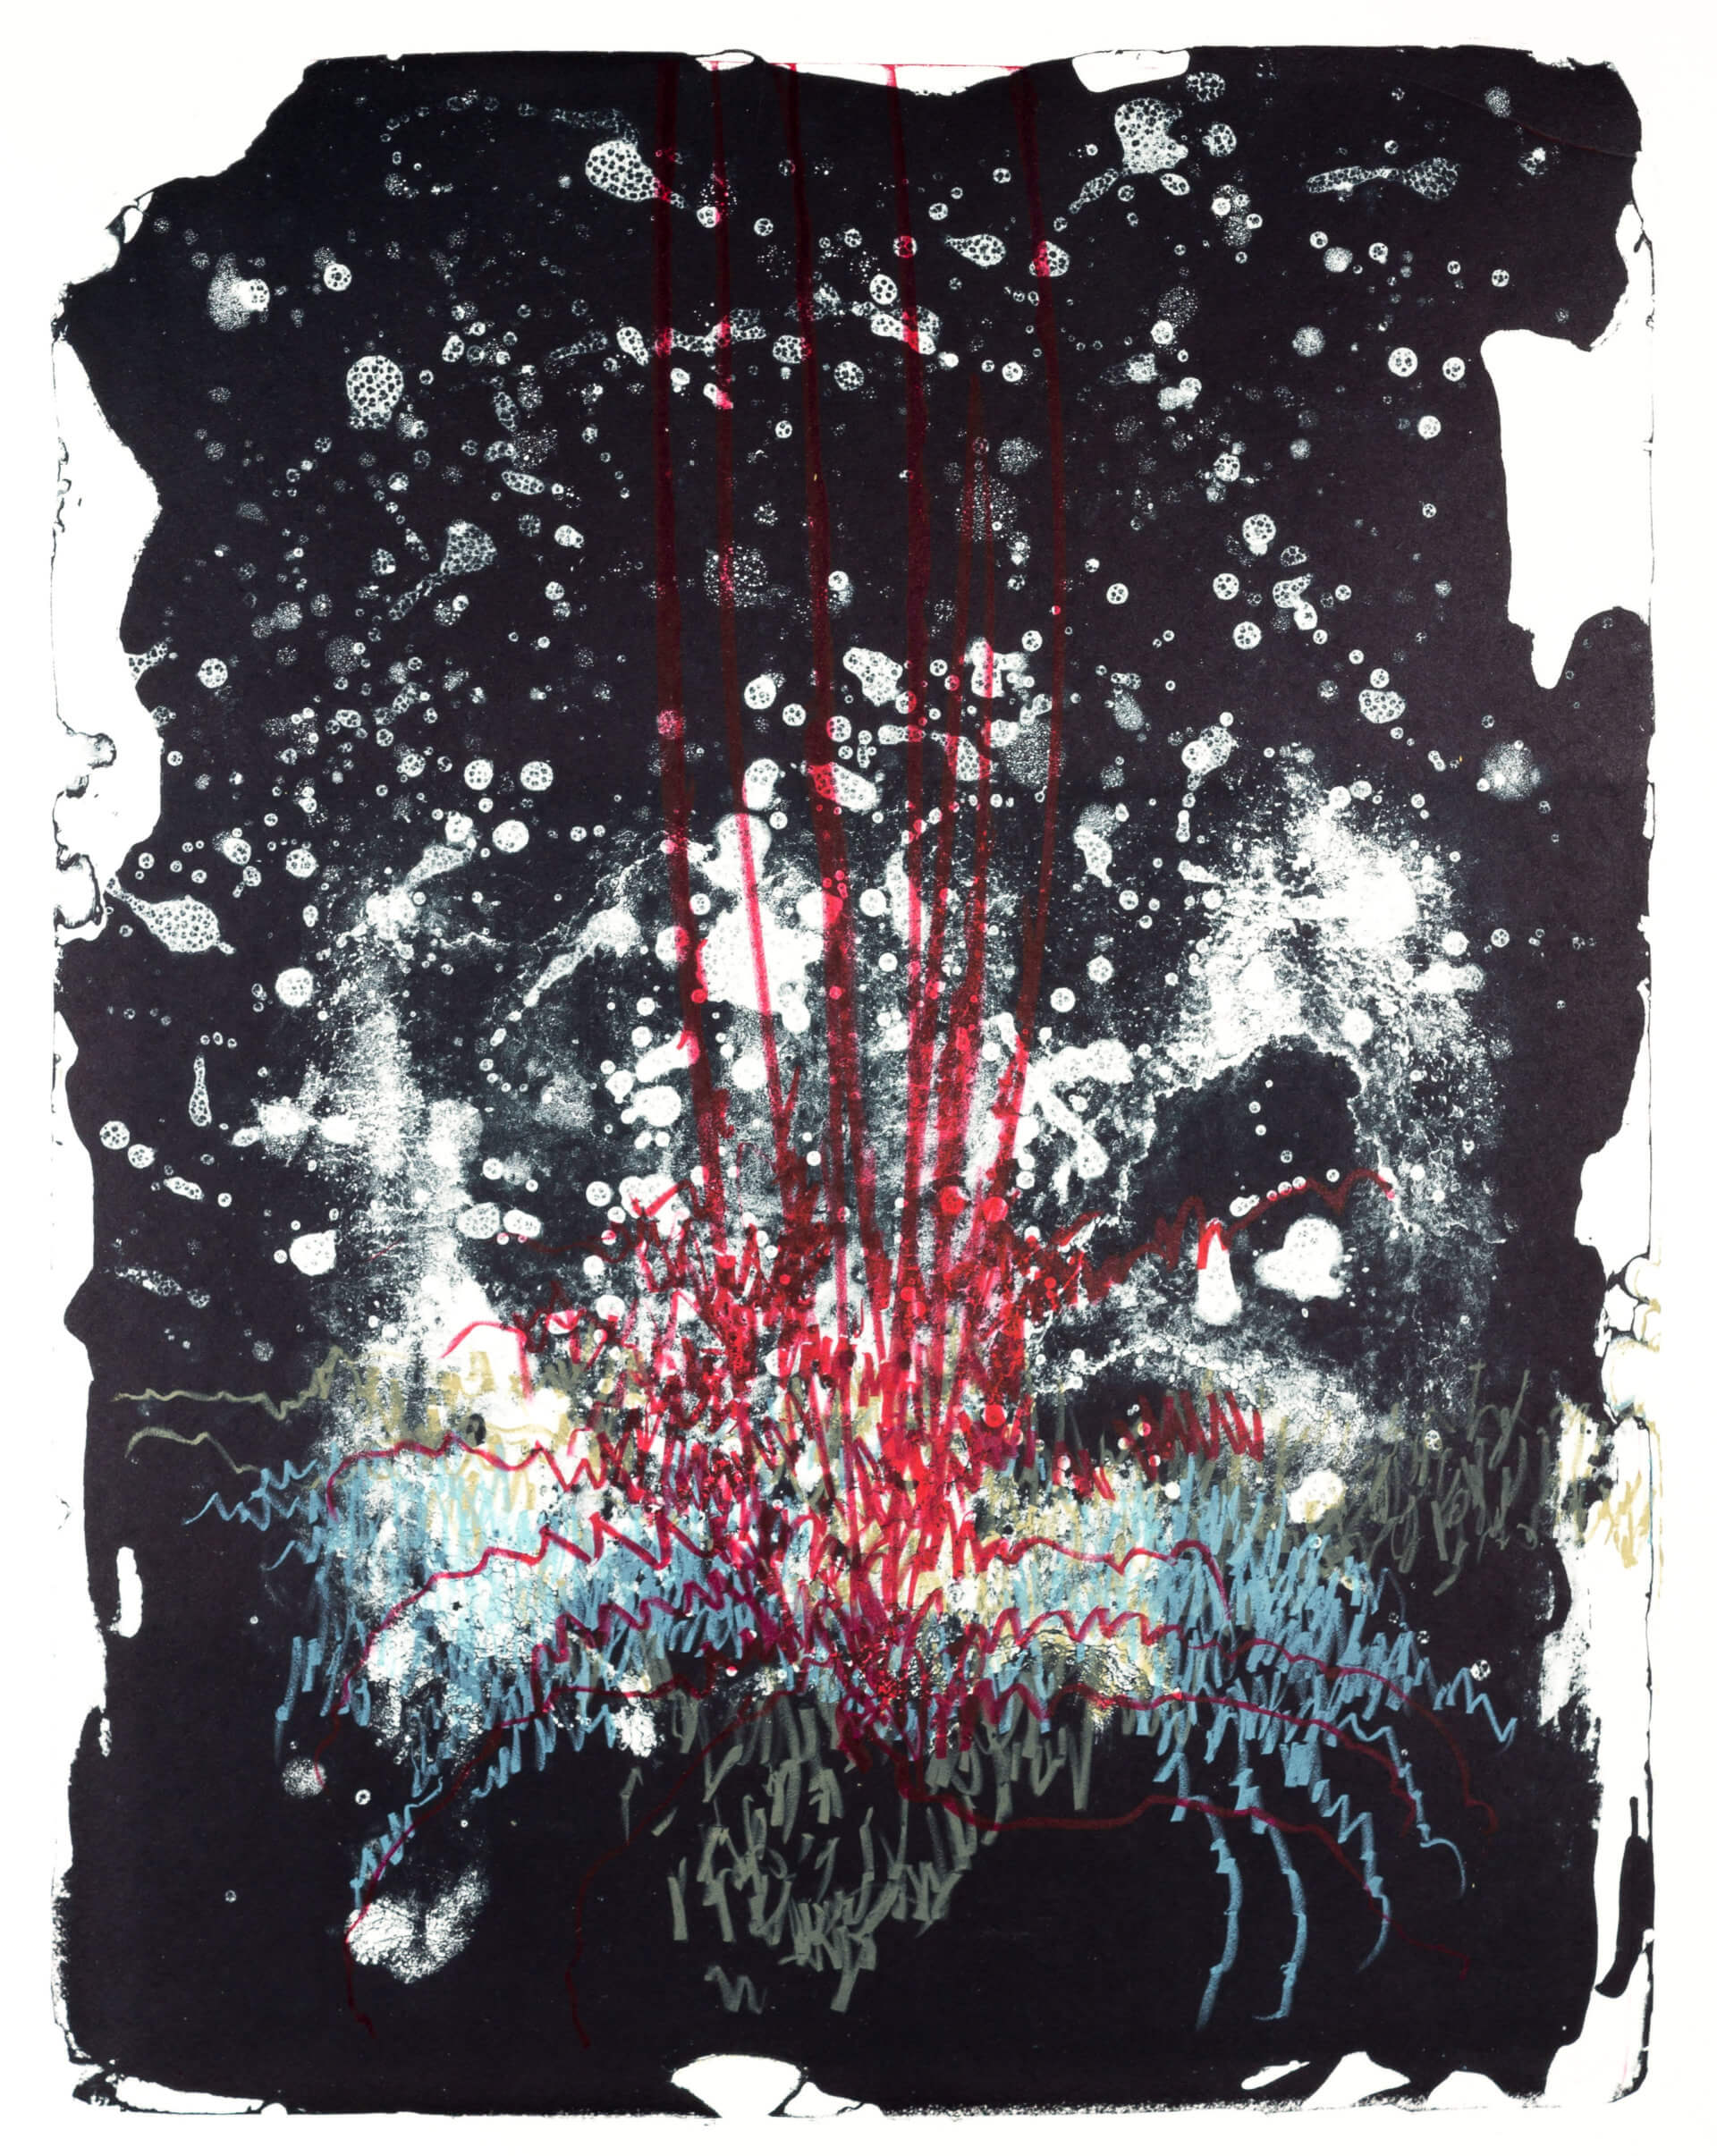 Wald X(D)-VI, 2019, Farblithographie, Unikat, 50x40 cm